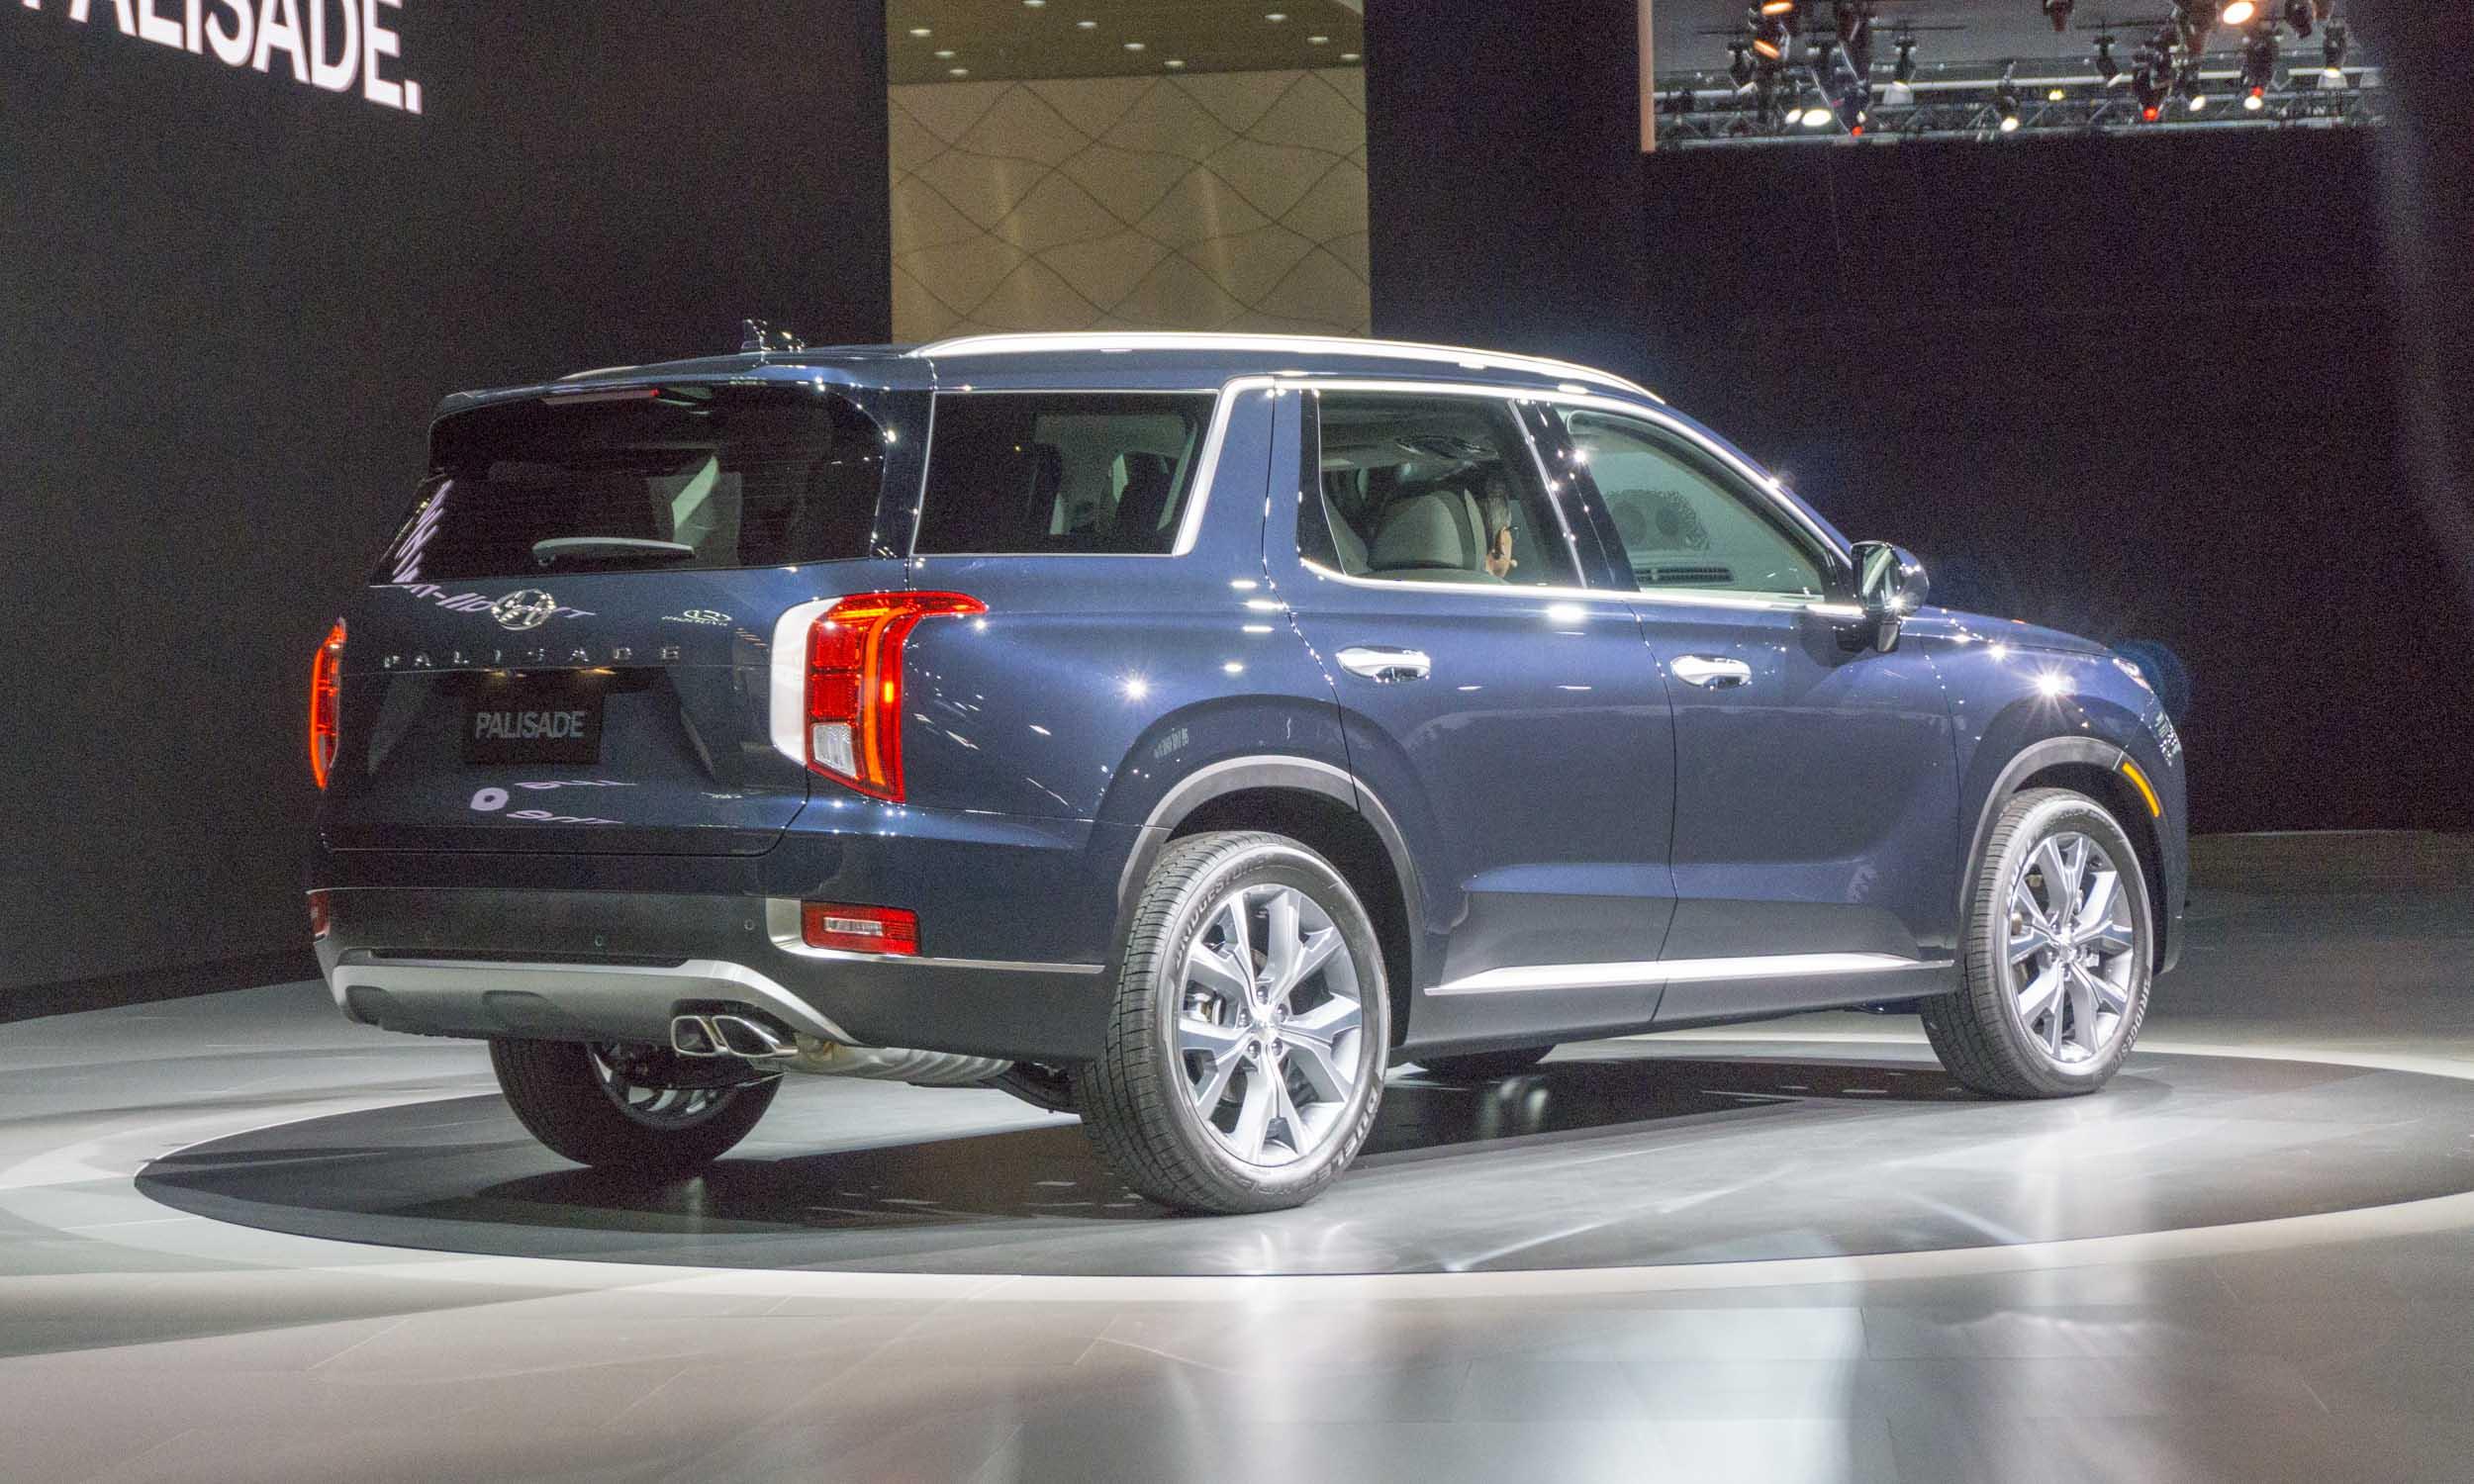 3 Row Seating Suv >> 2018 L.A. Auto Show: 2020 Hyundai Palisade Rocks L.A. - » AutoNXT